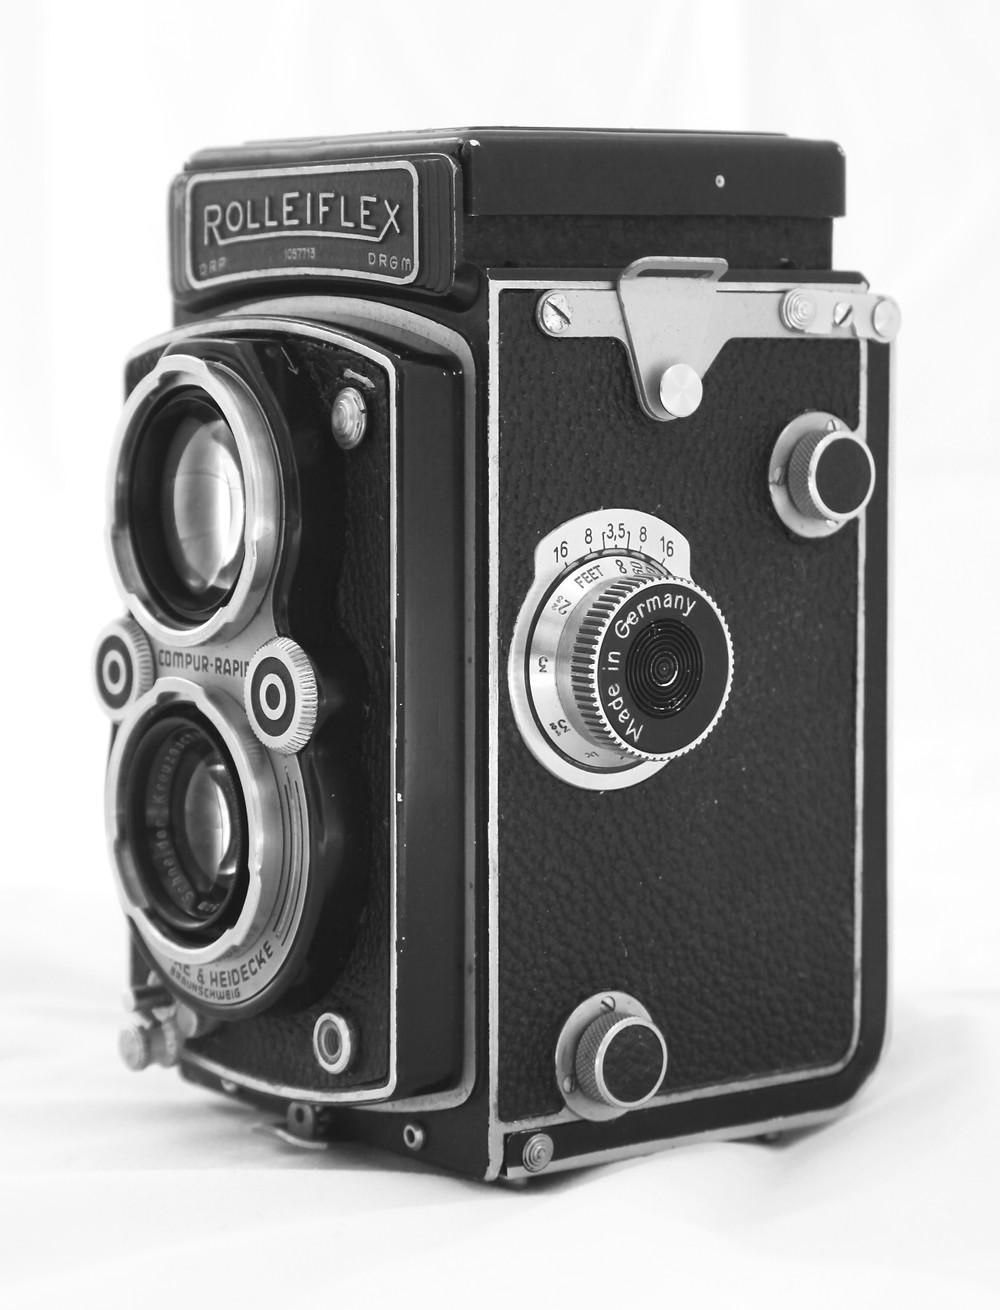 Rolleiflex Automat film camera